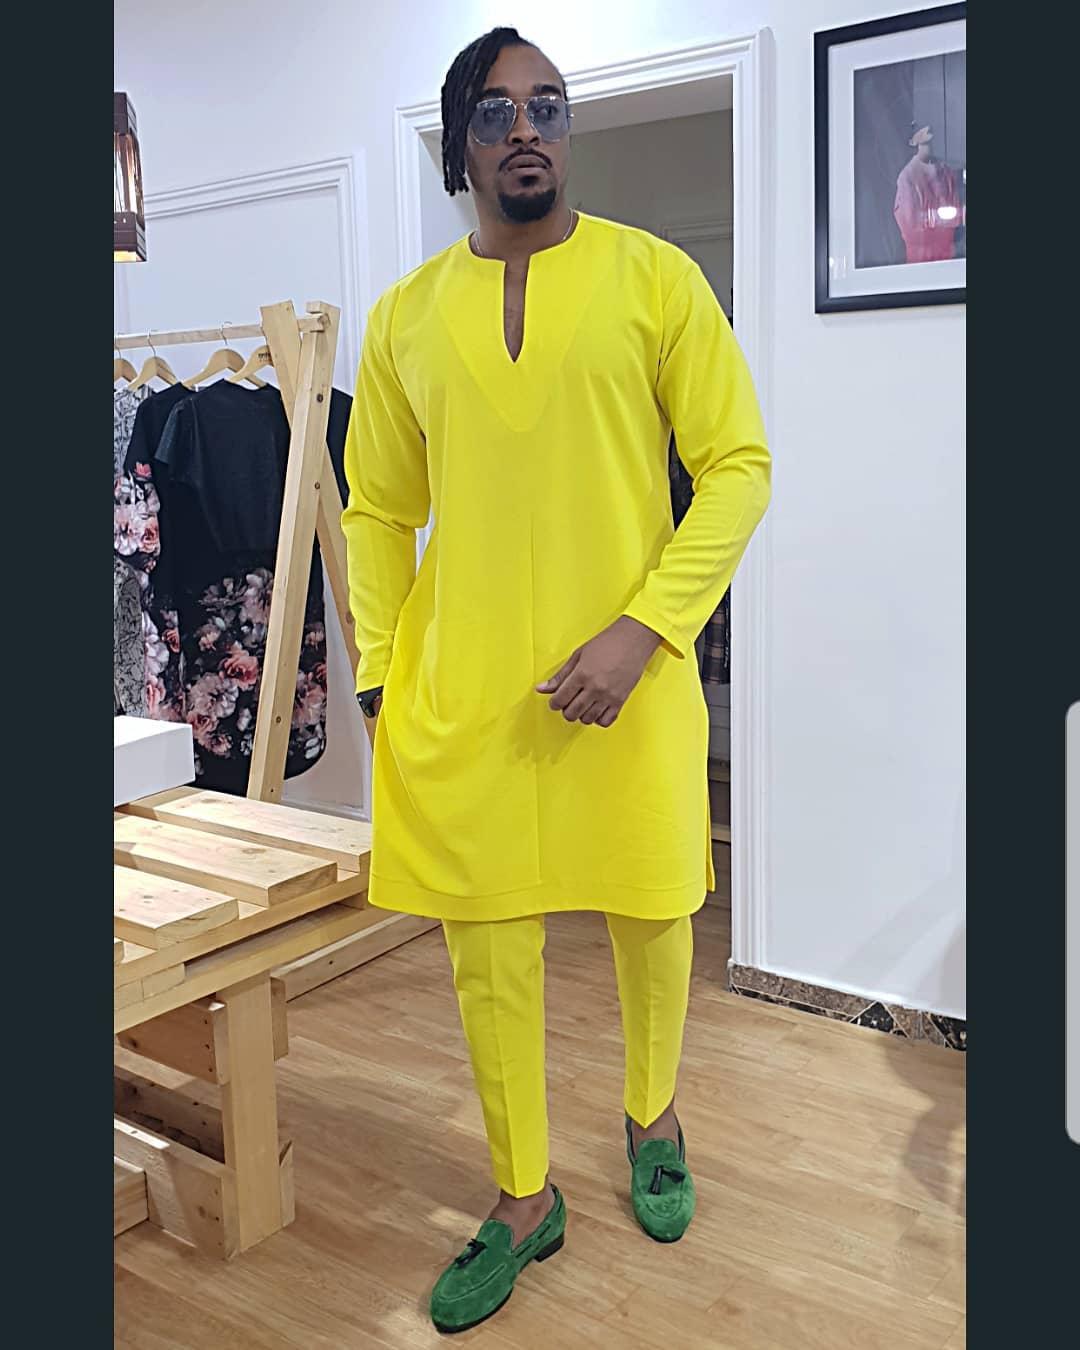 bryan-okwara-nigerian-male-celebrities-style